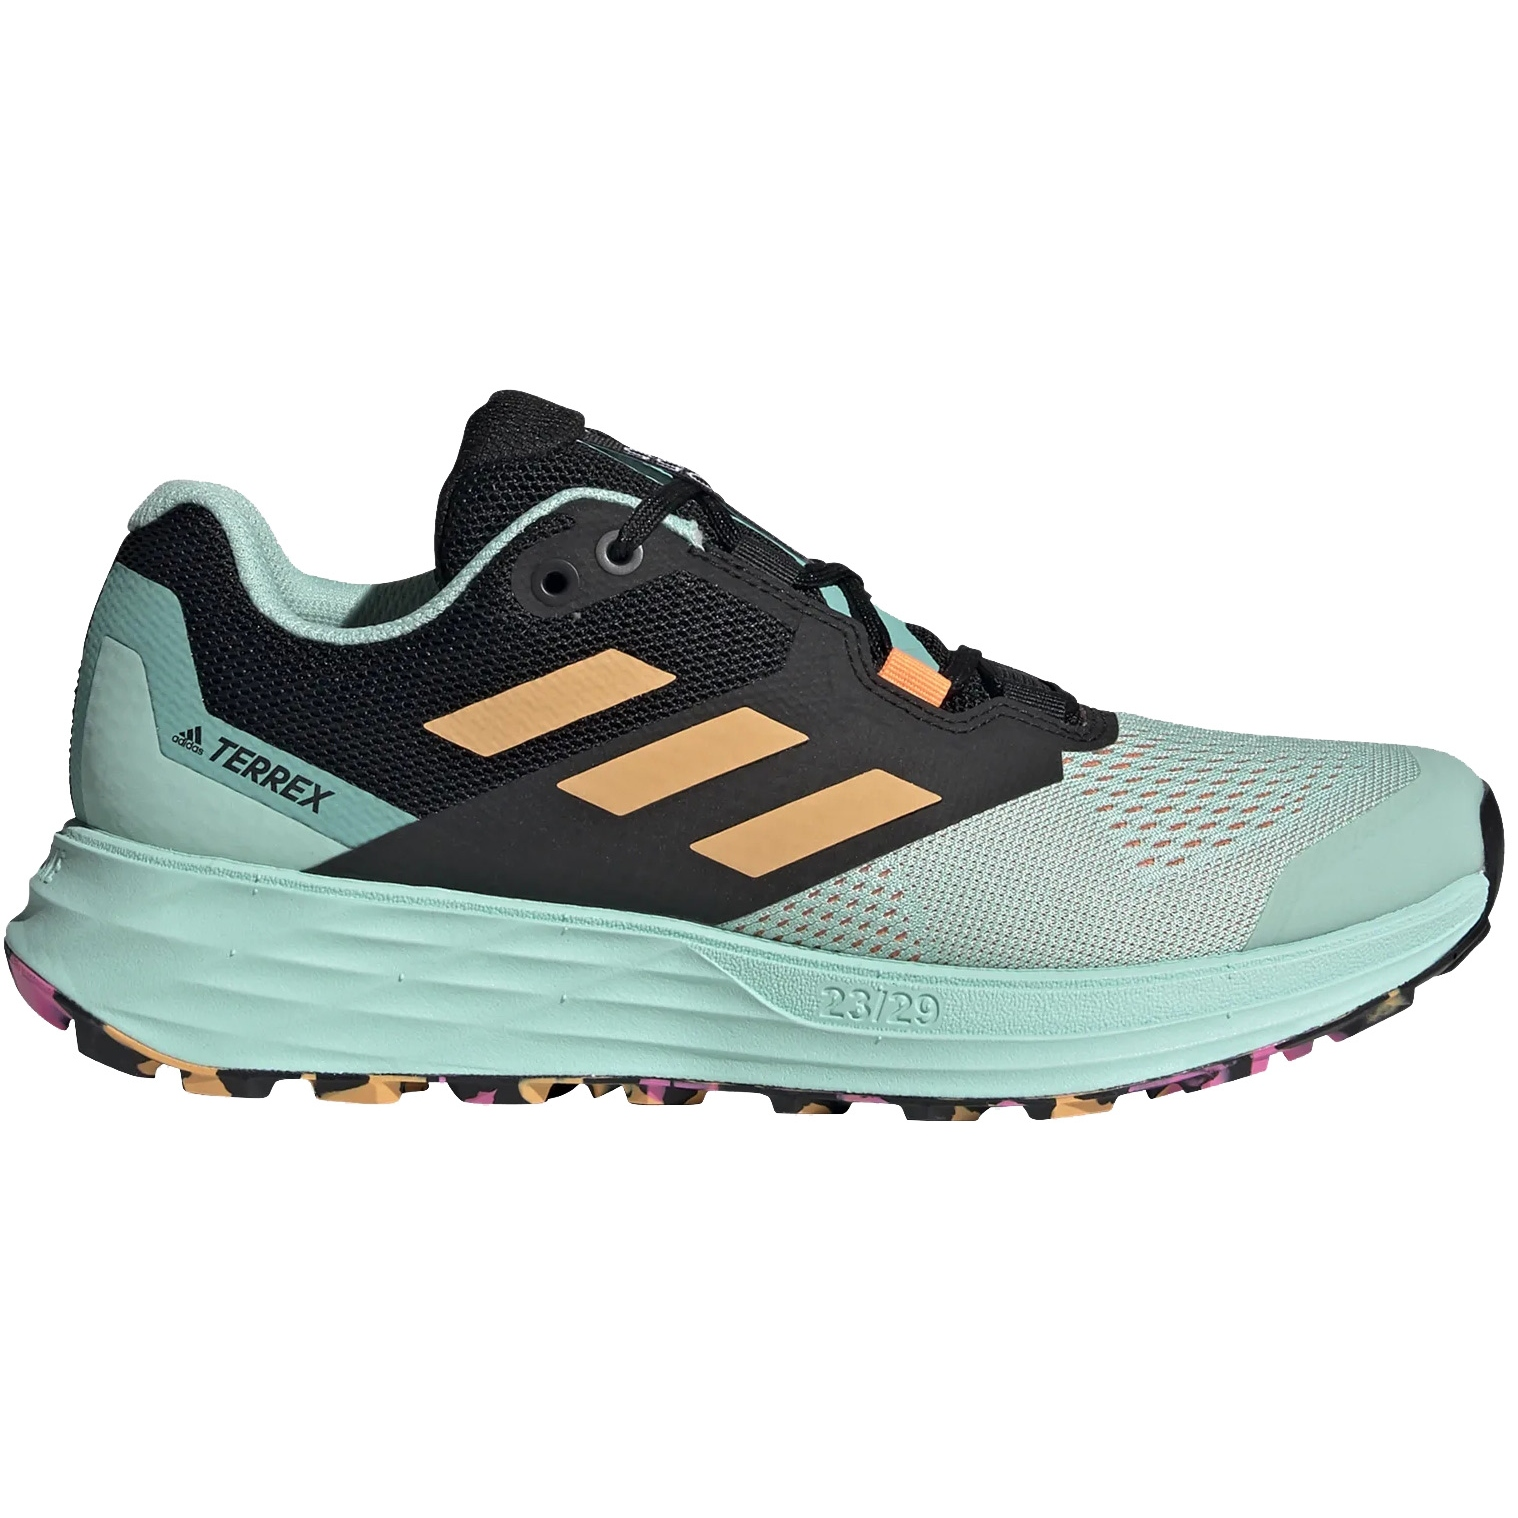 adidas TERREX Two Flow Trail Running Zapatillas para Mujer - clear mint/hazy orange/screaming pink FW2712